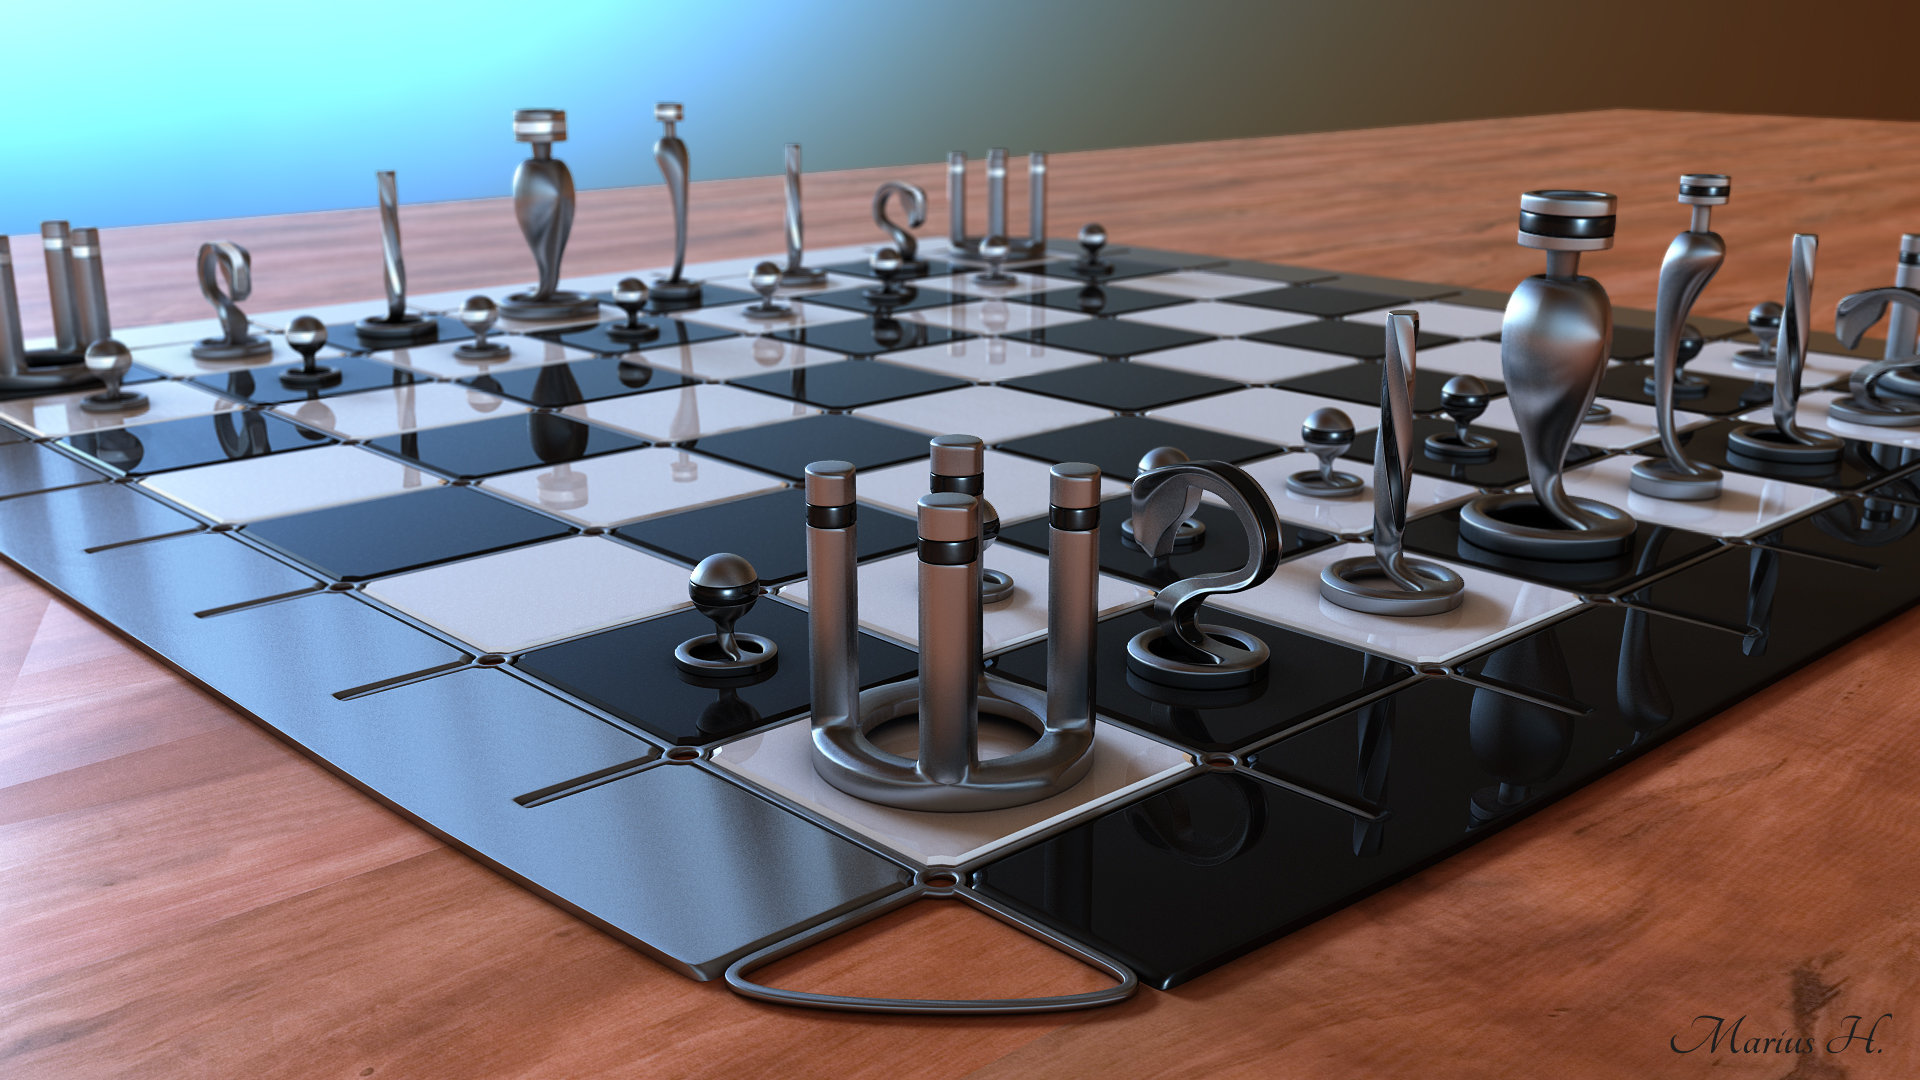 marius popa - modern chess set